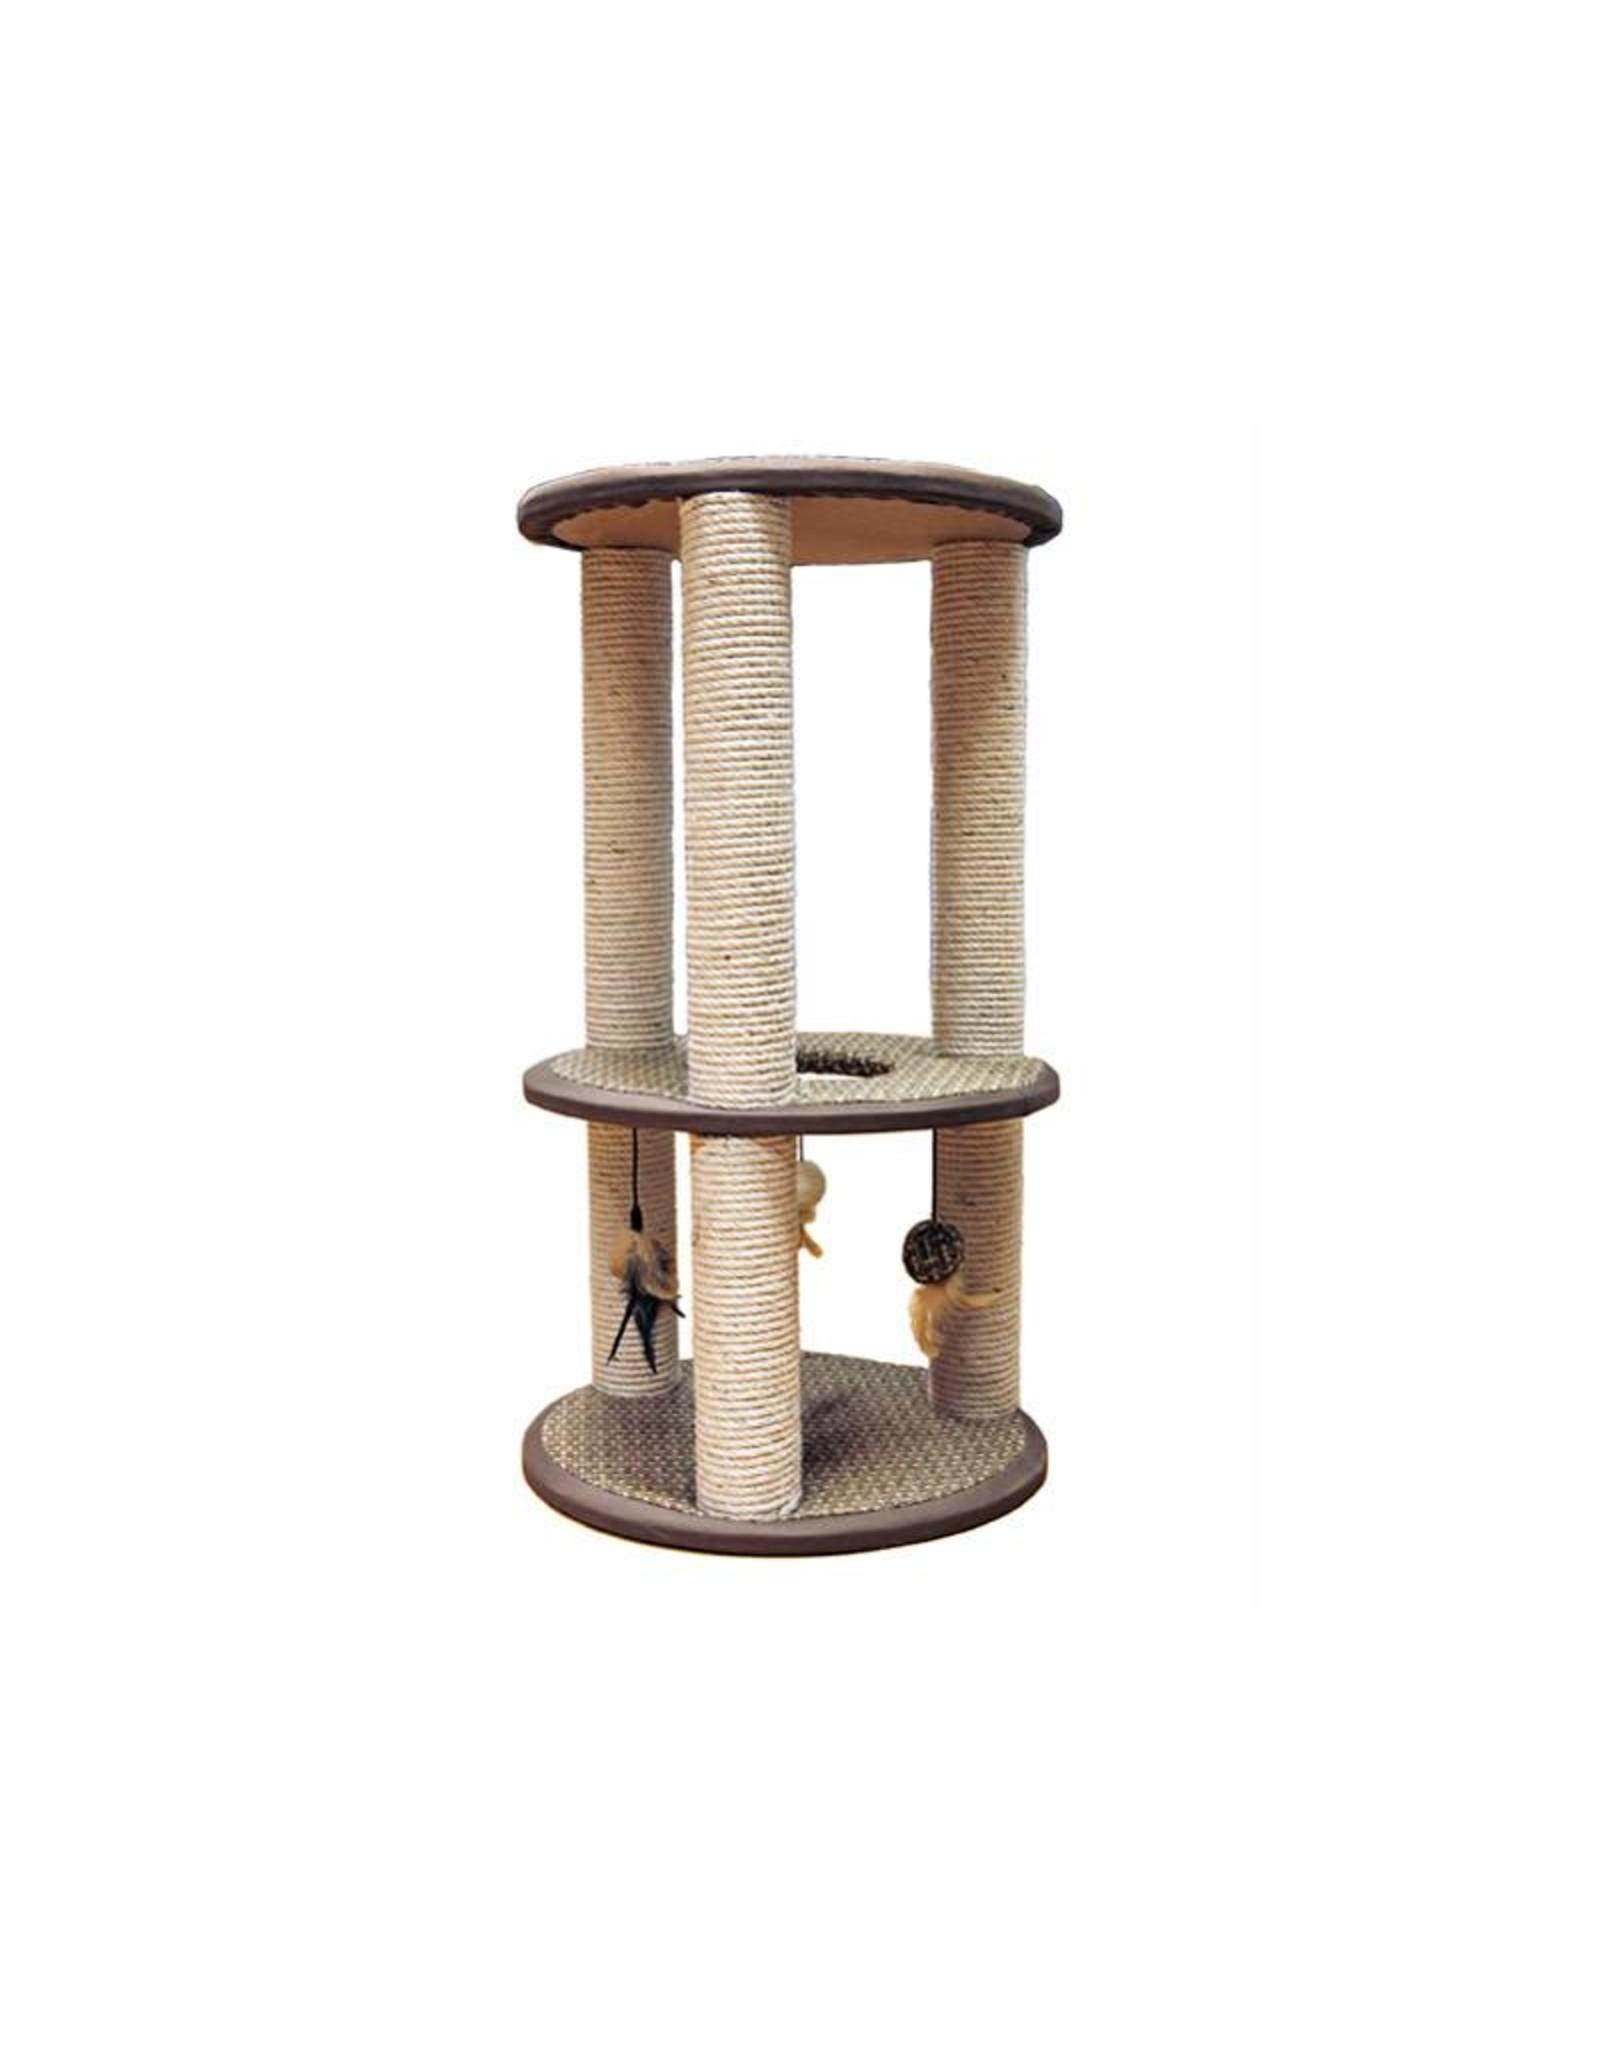 Rosewood Cinnamon 3 Post Cat Scratching Post